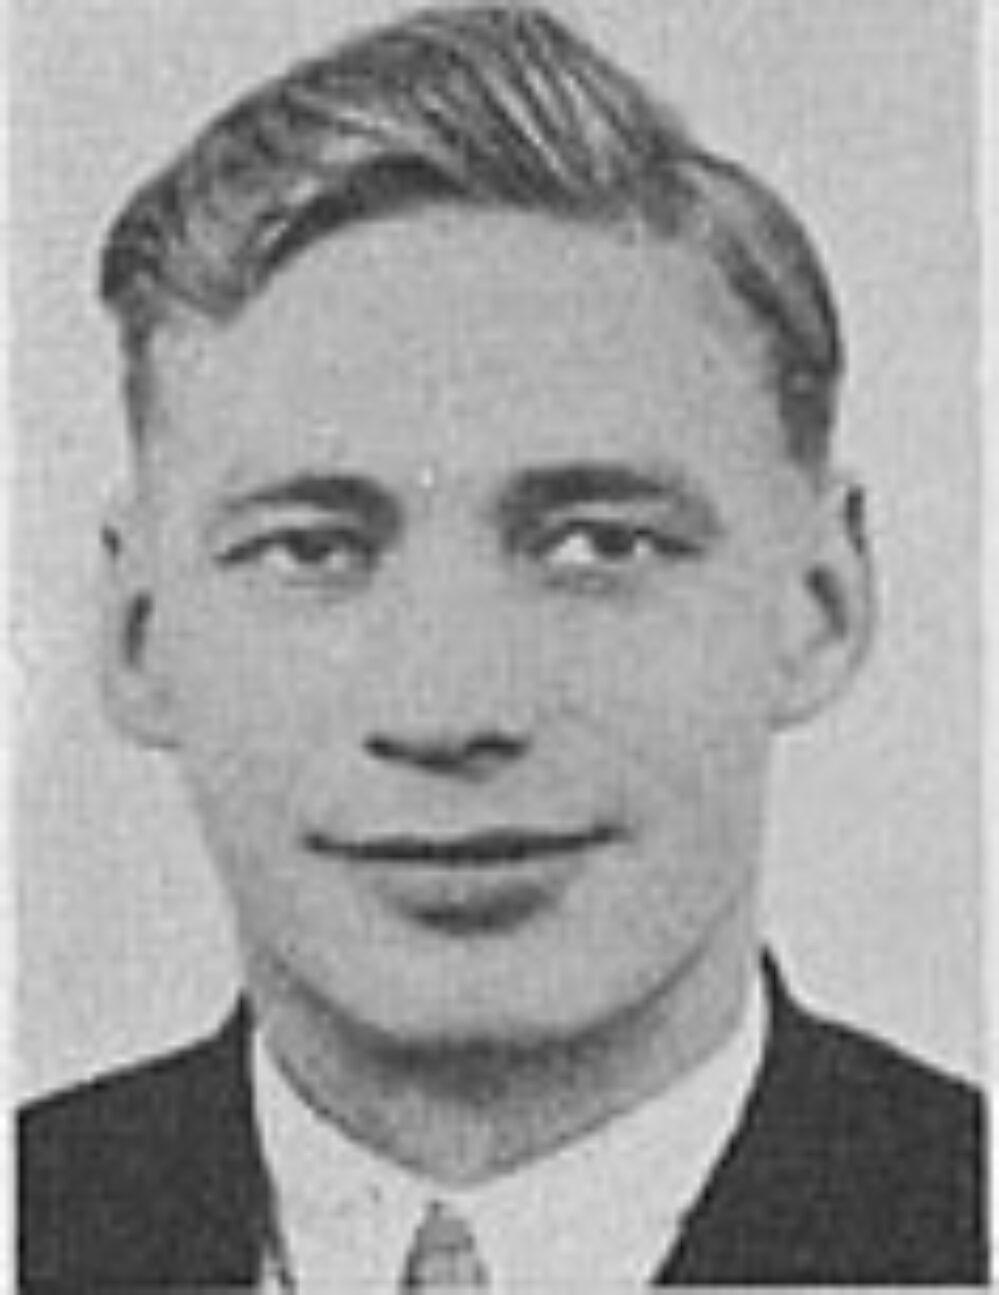 Harald Sigurd Olaus Haraldsen